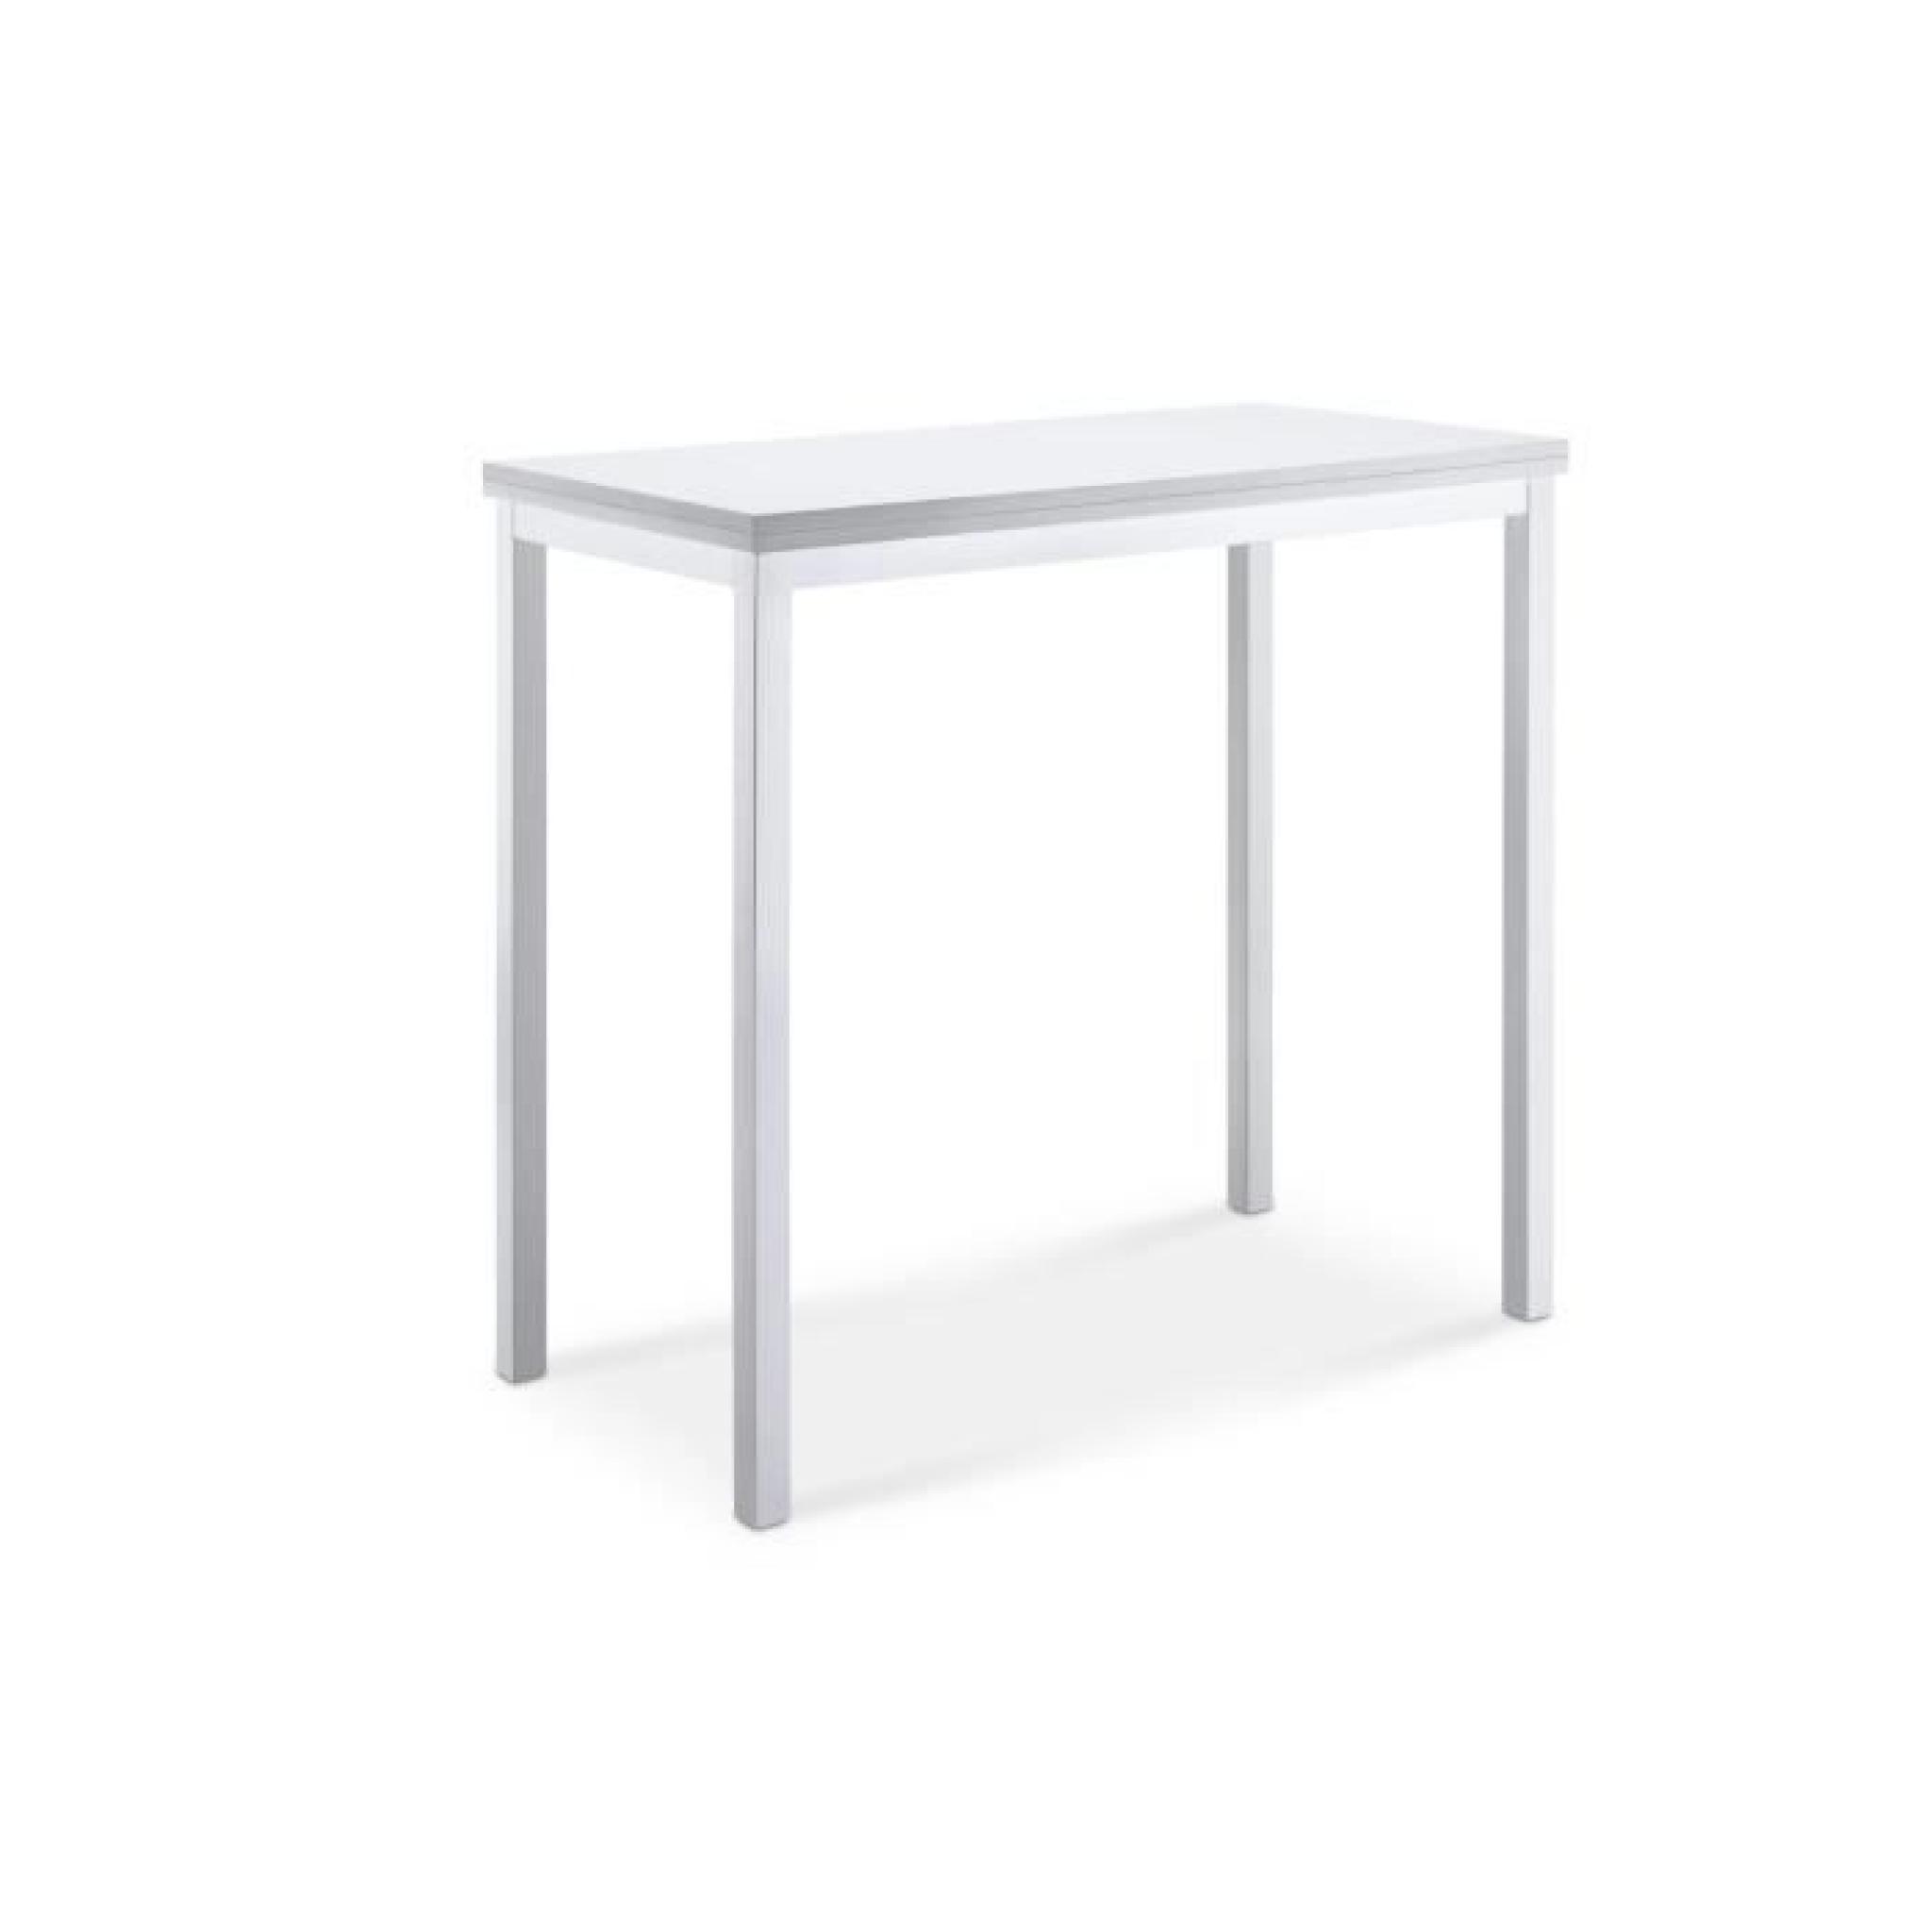 lira table de bar extensible blanc achat vente table. Black Bedroom Furniture Sets. Home Design Ideas